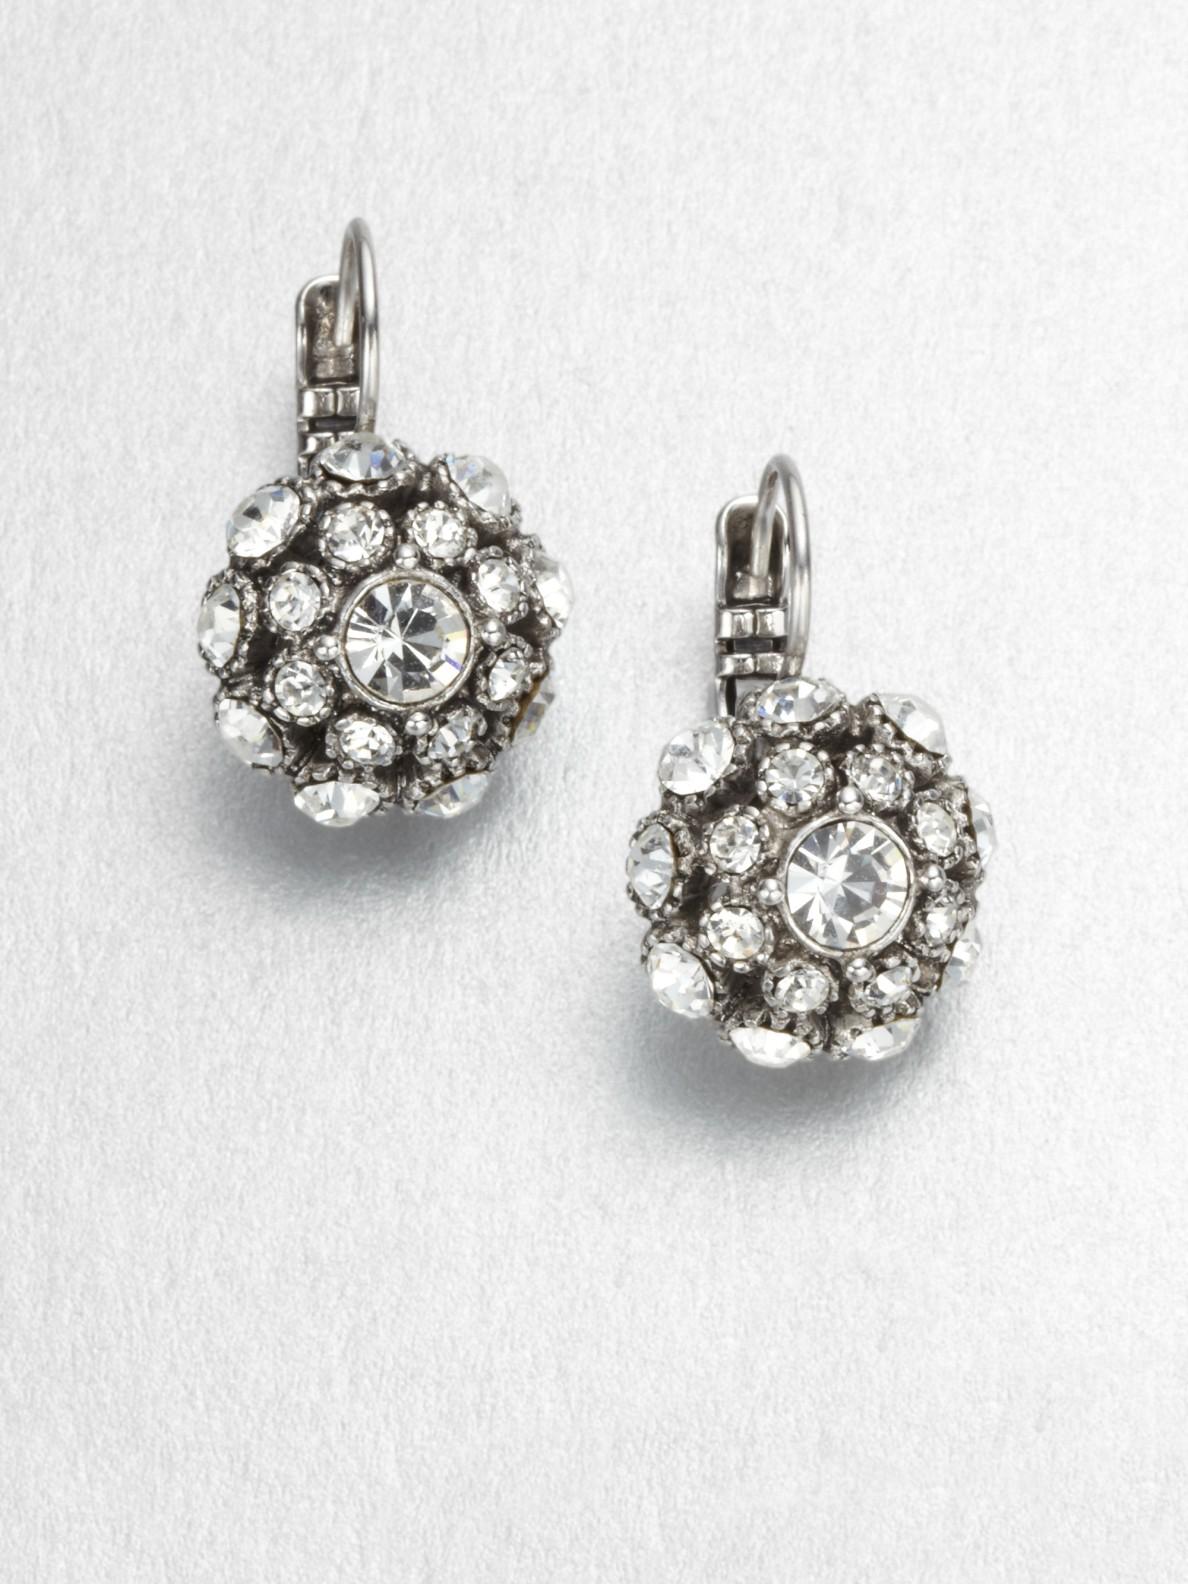 Kate Spade Lady Marmalade Ball Leverback Earrings